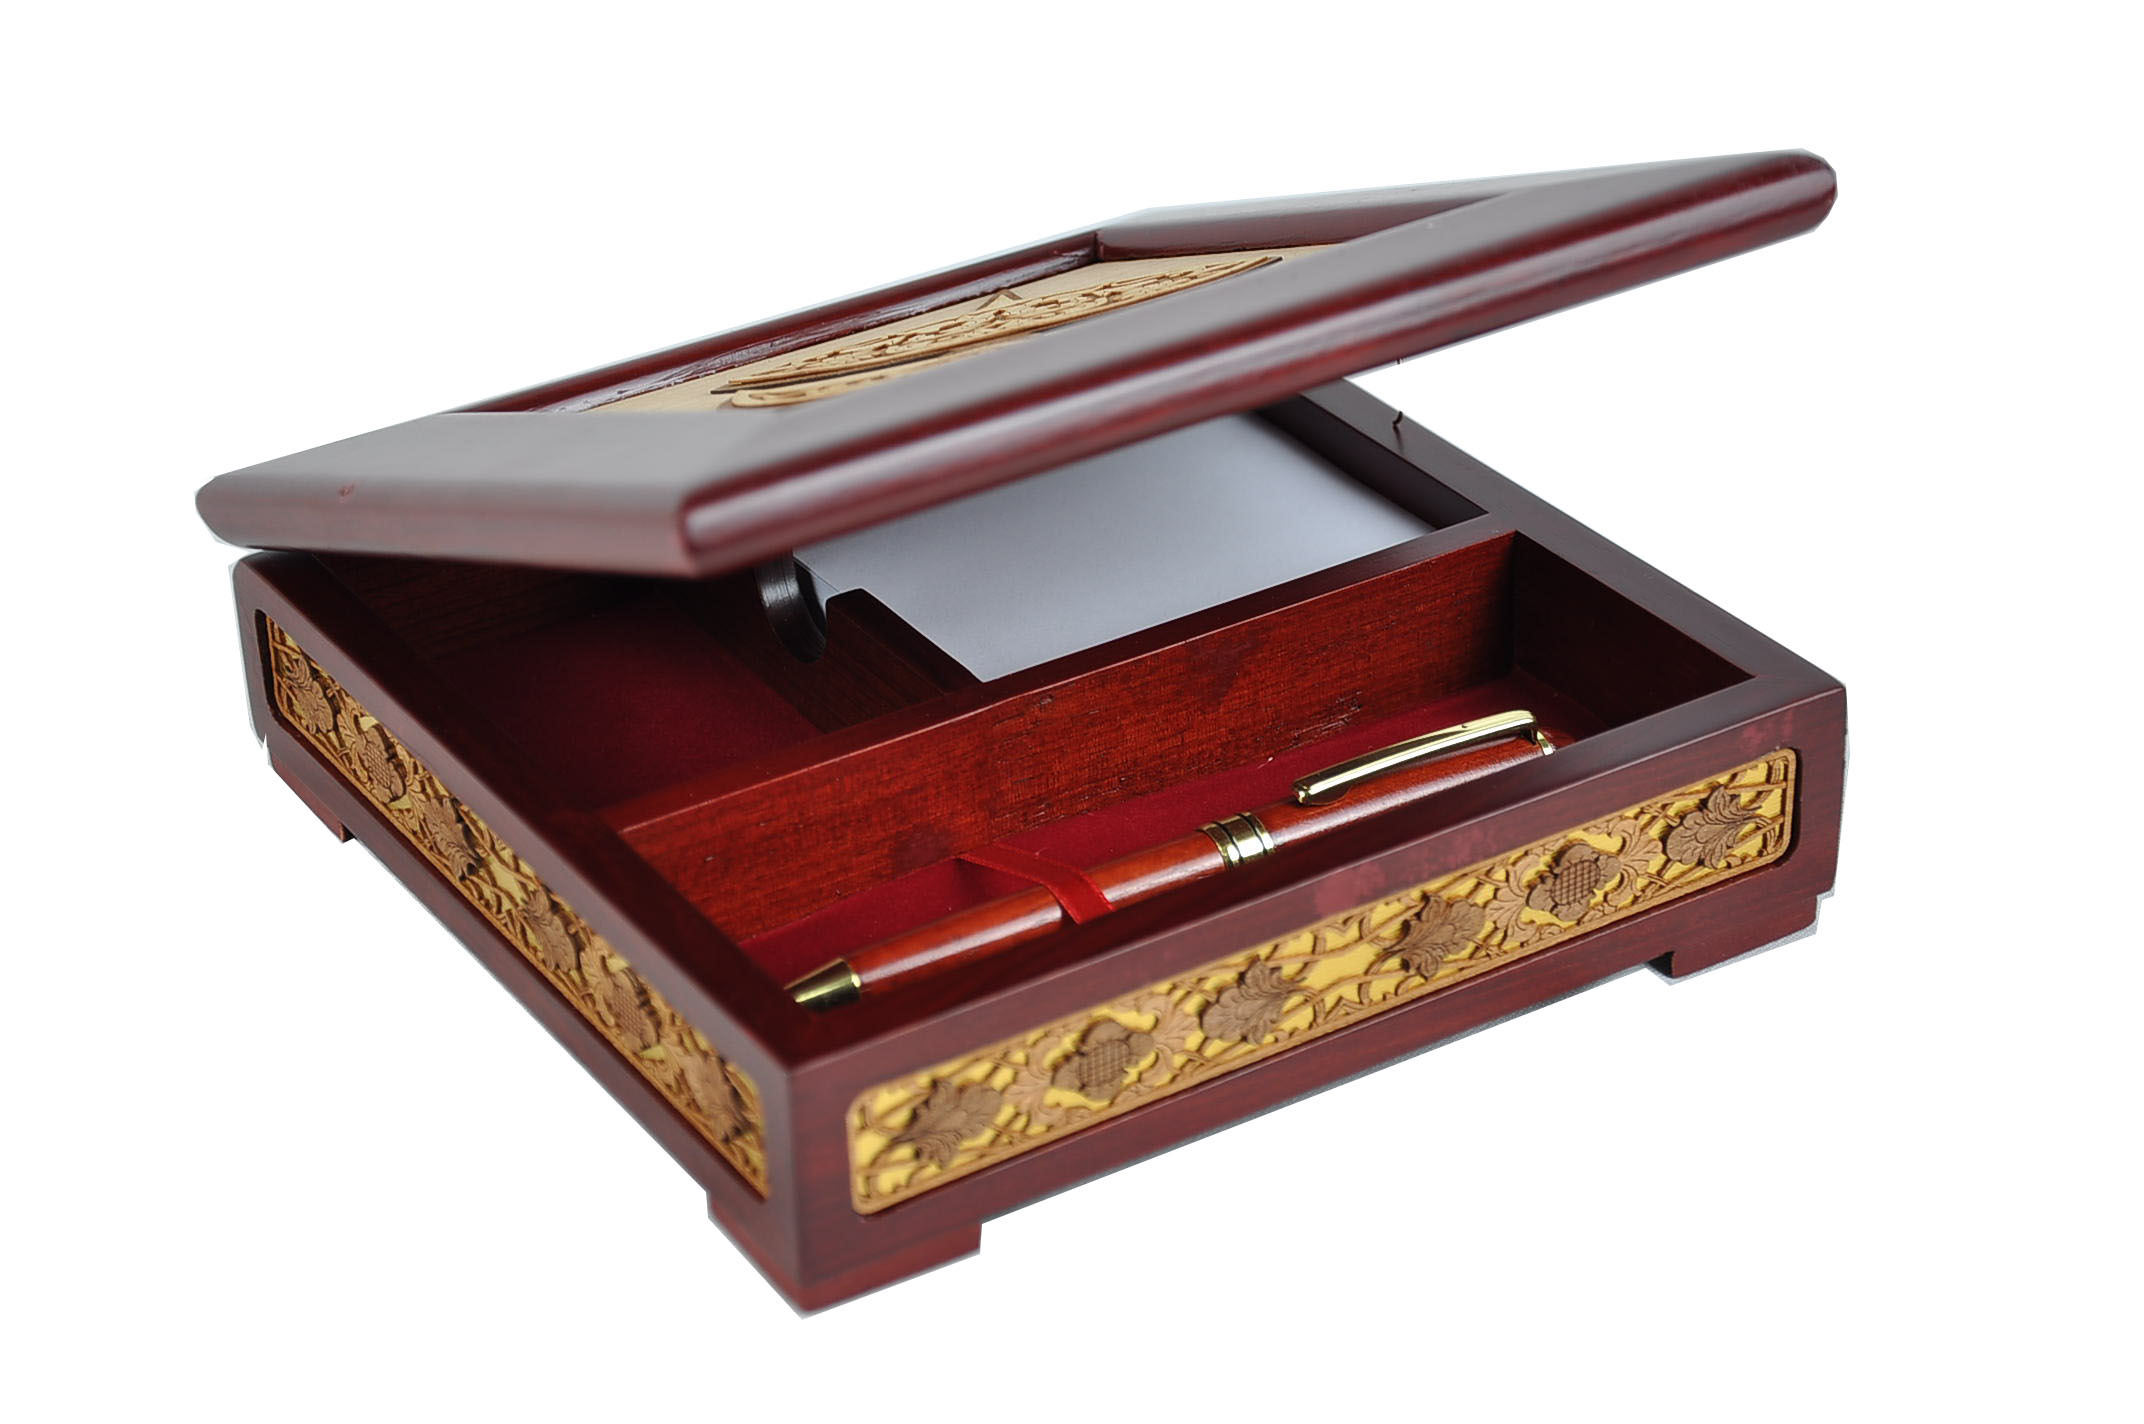 Wooden Box (Design Wau) 3 in 1